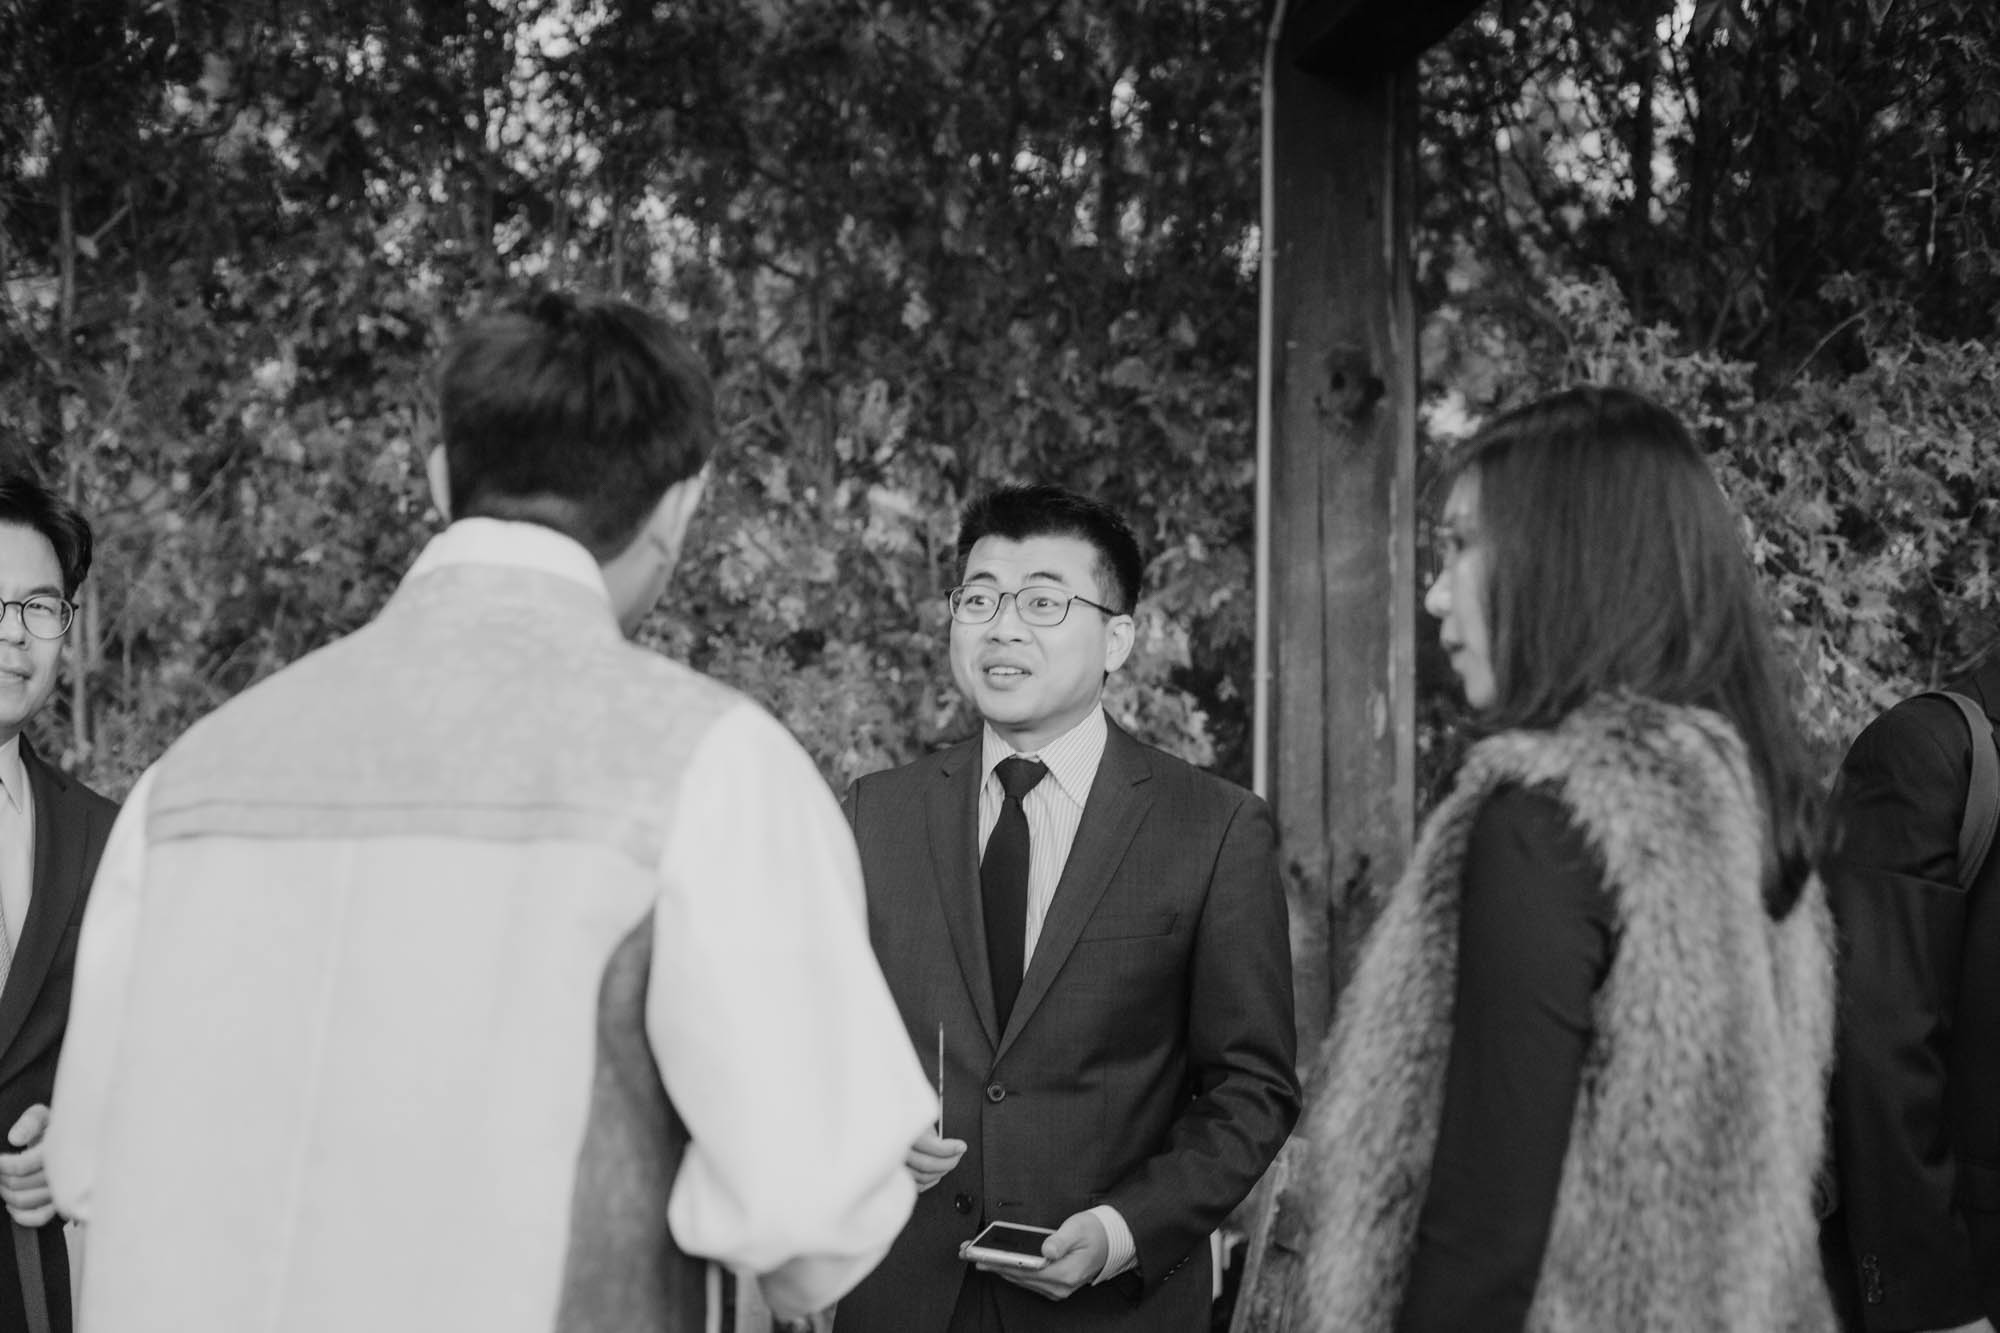 hastings-on-hudson-wedding-photographer-44.jpg